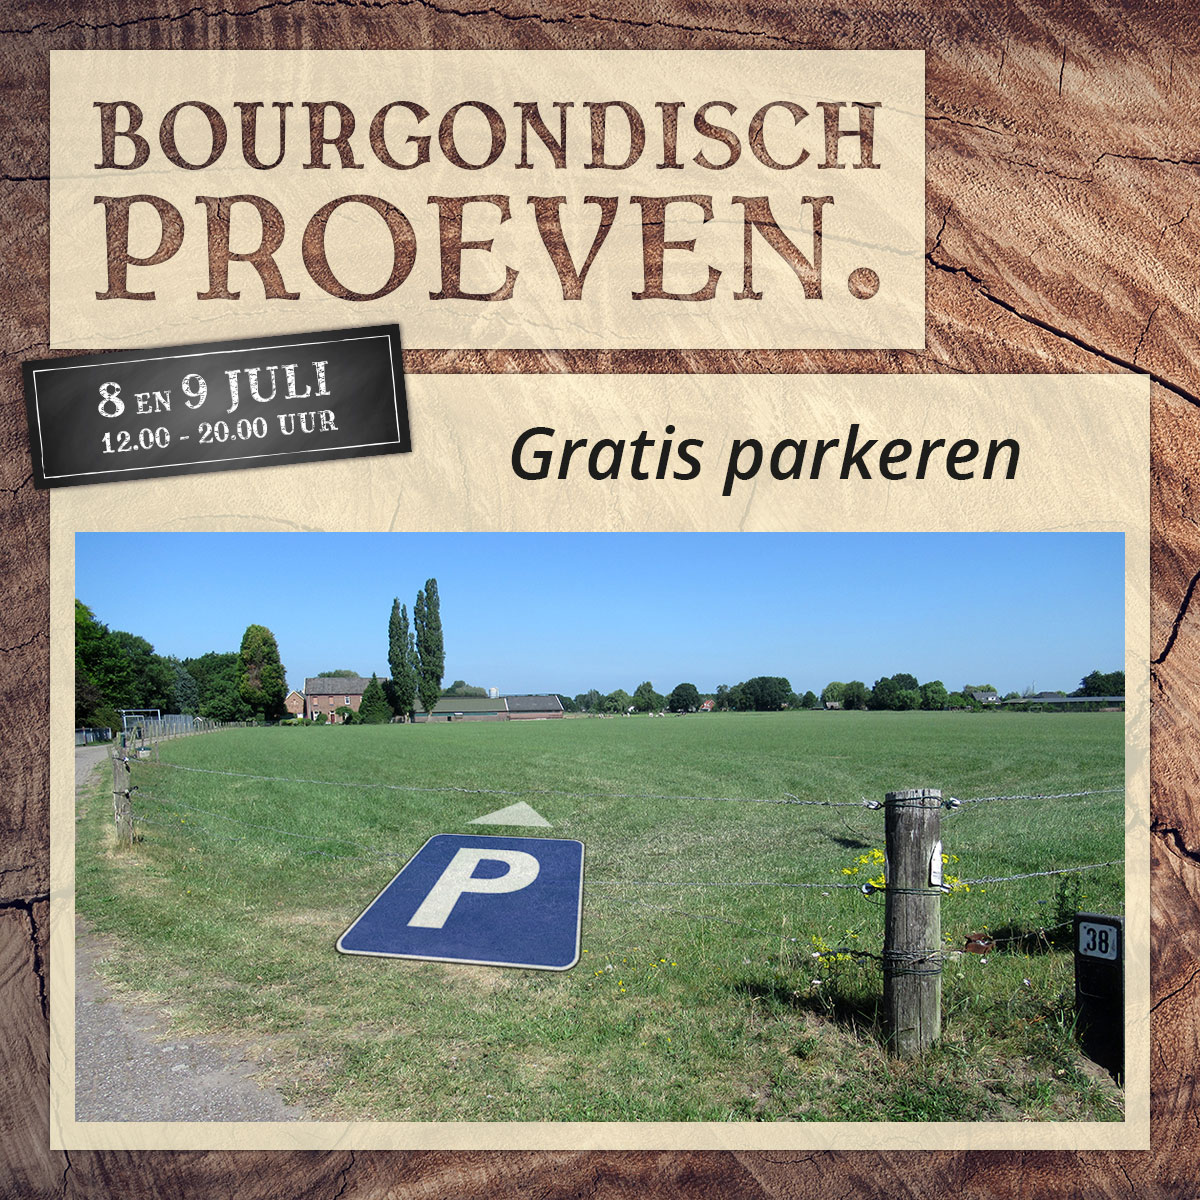 De Bourgondiër – Bourgondisch Proeven. – Facebookbericht – Gratis-parkeren